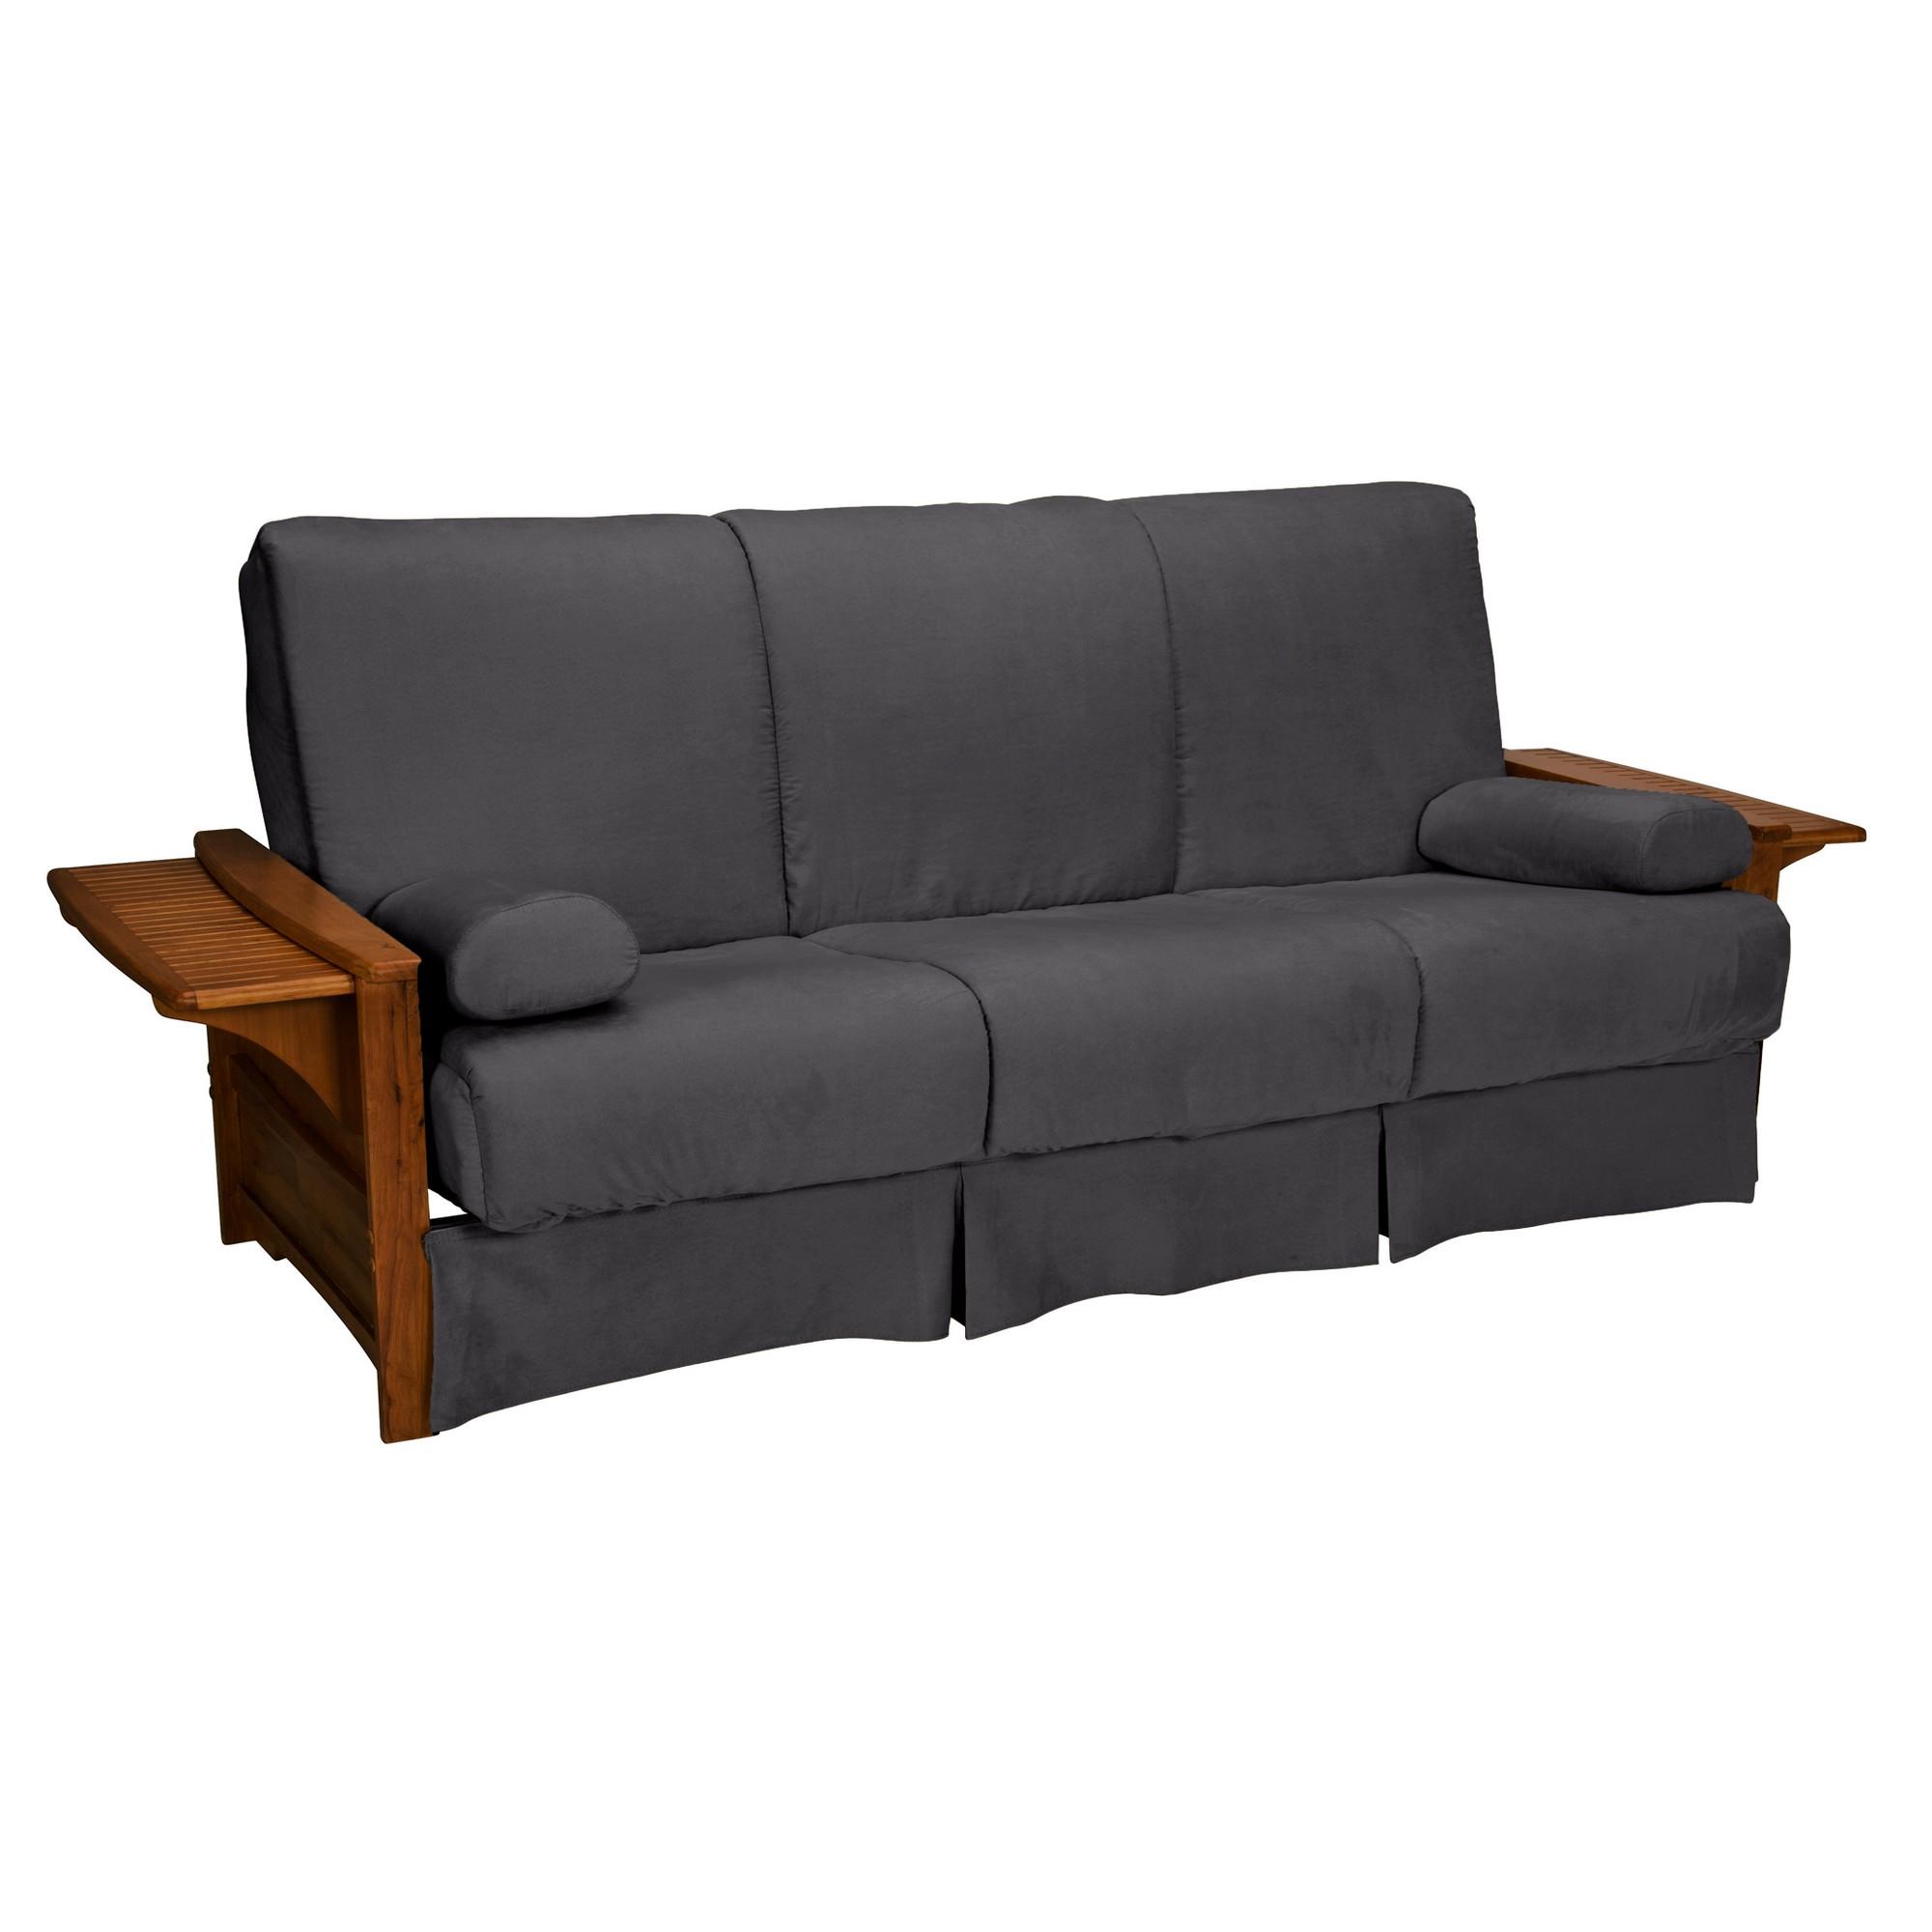 Brooklyn Perfect Futon Sofa Sleeper Walnut Wood Finish Slate Gray Upholstery Chair